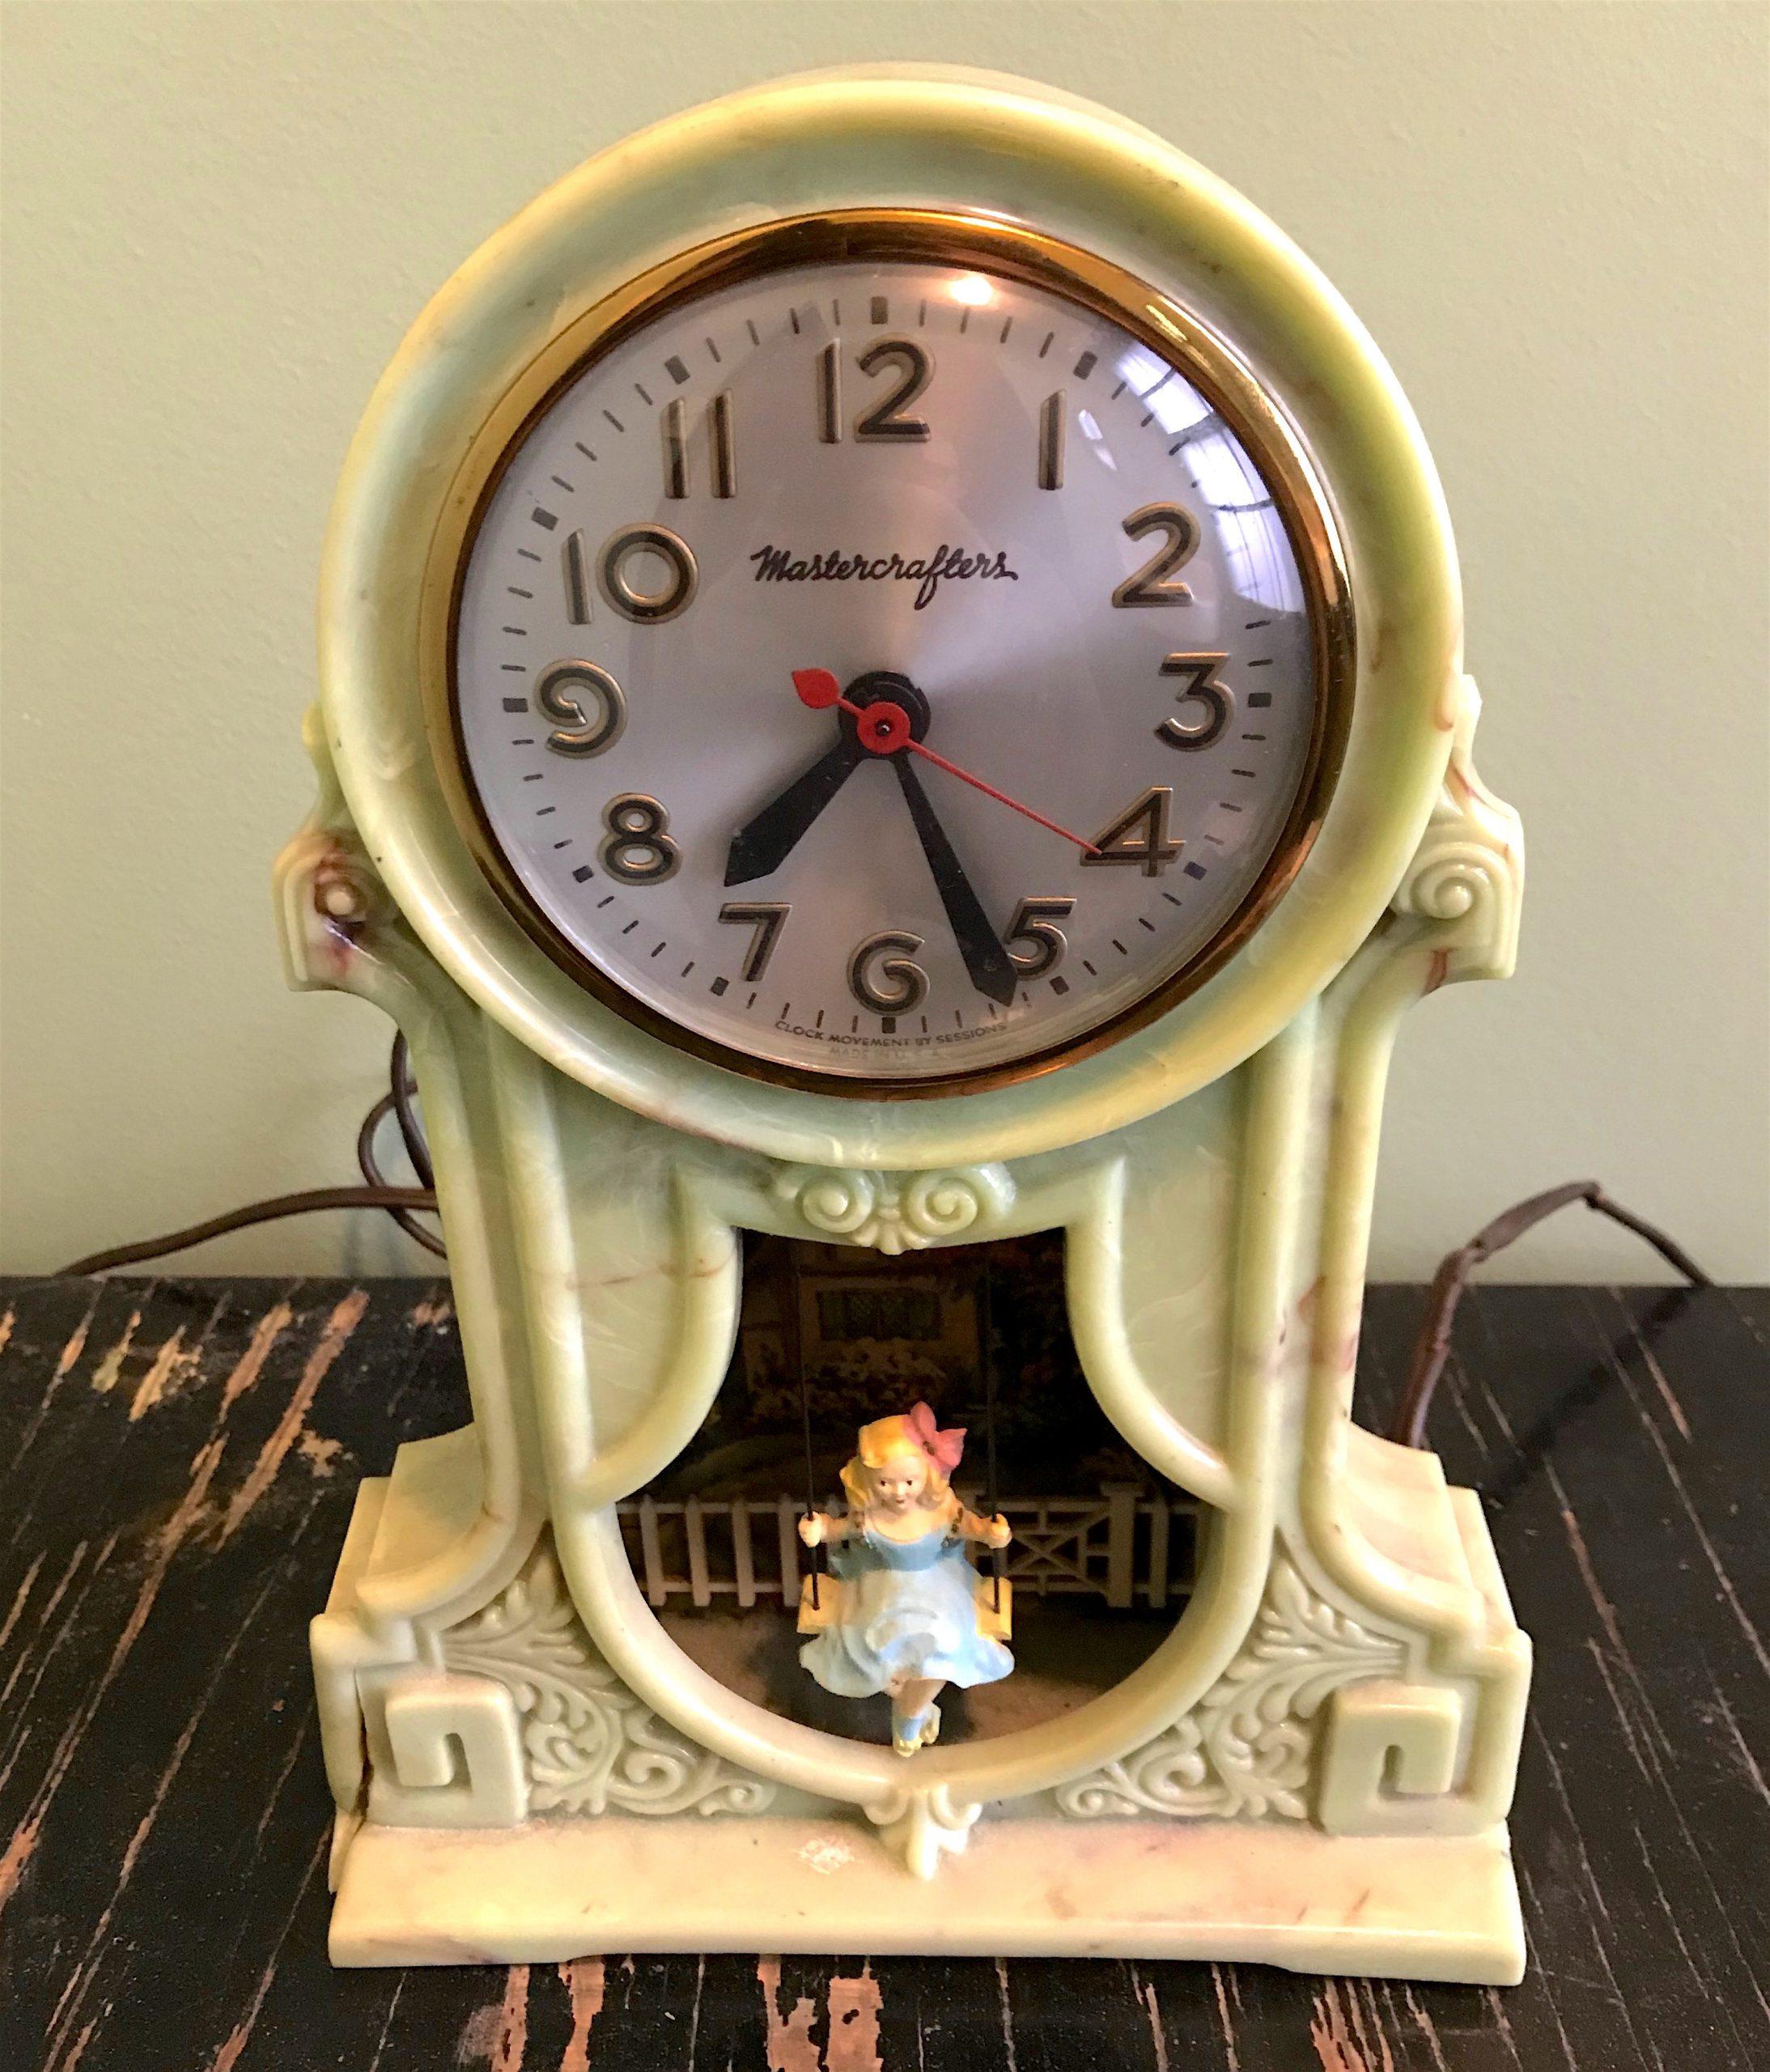 Mastercrafters Swingtime Bakelite Clock